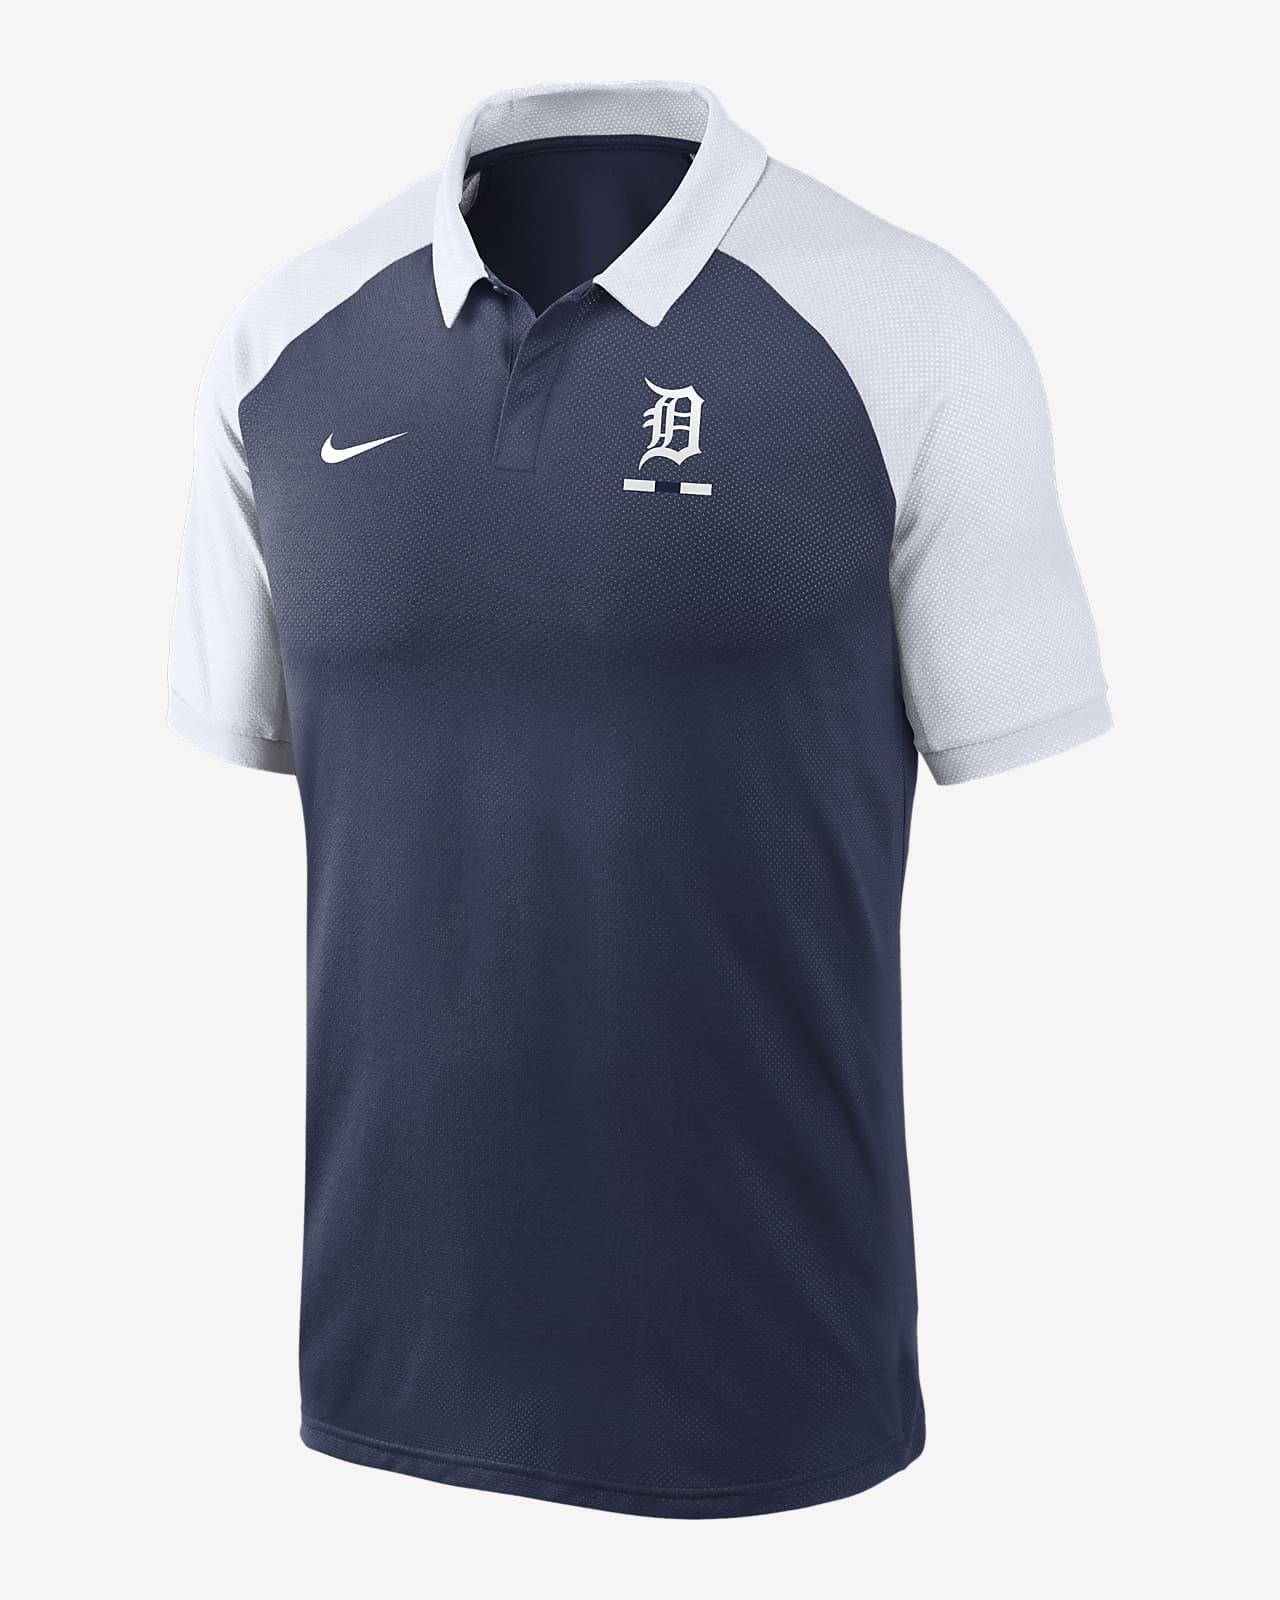 Nike Dri-FIT Legacy (MLB Detroit Tigers) Men's Polo